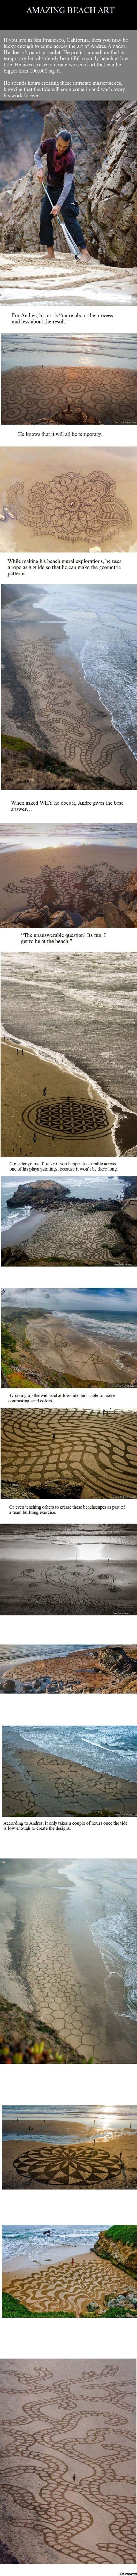 funny-gifs-amazing-beach-art